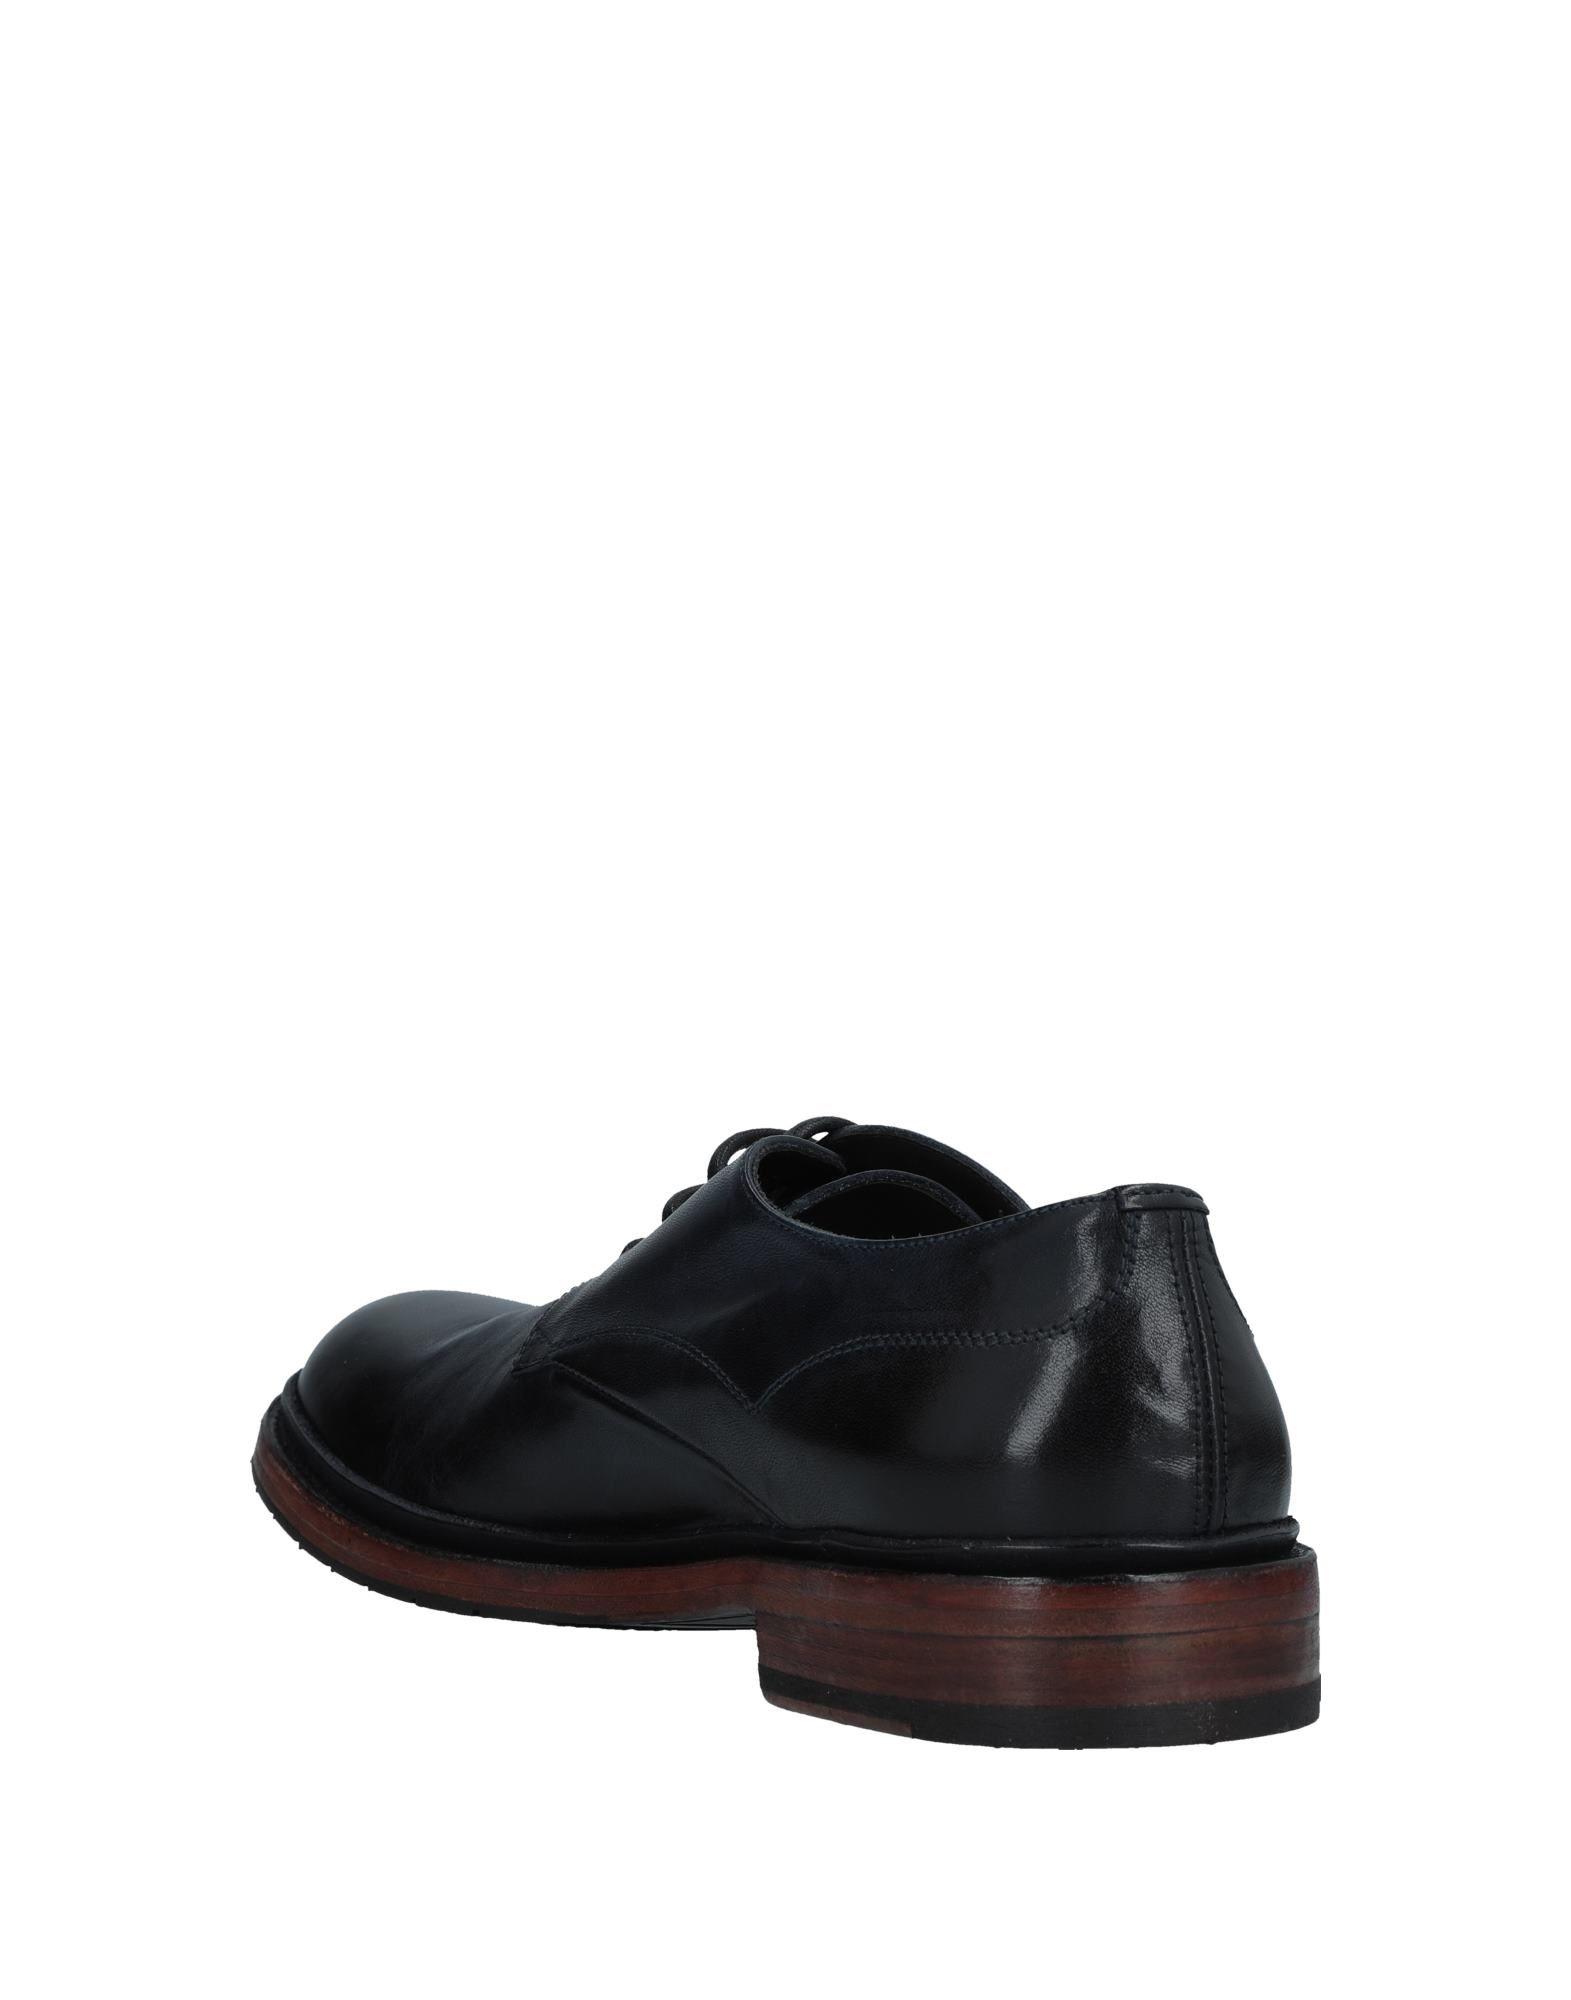 Pantanetti Schnürschuhe Herren  11536747GX Heiße Schuhe 6a4a8d